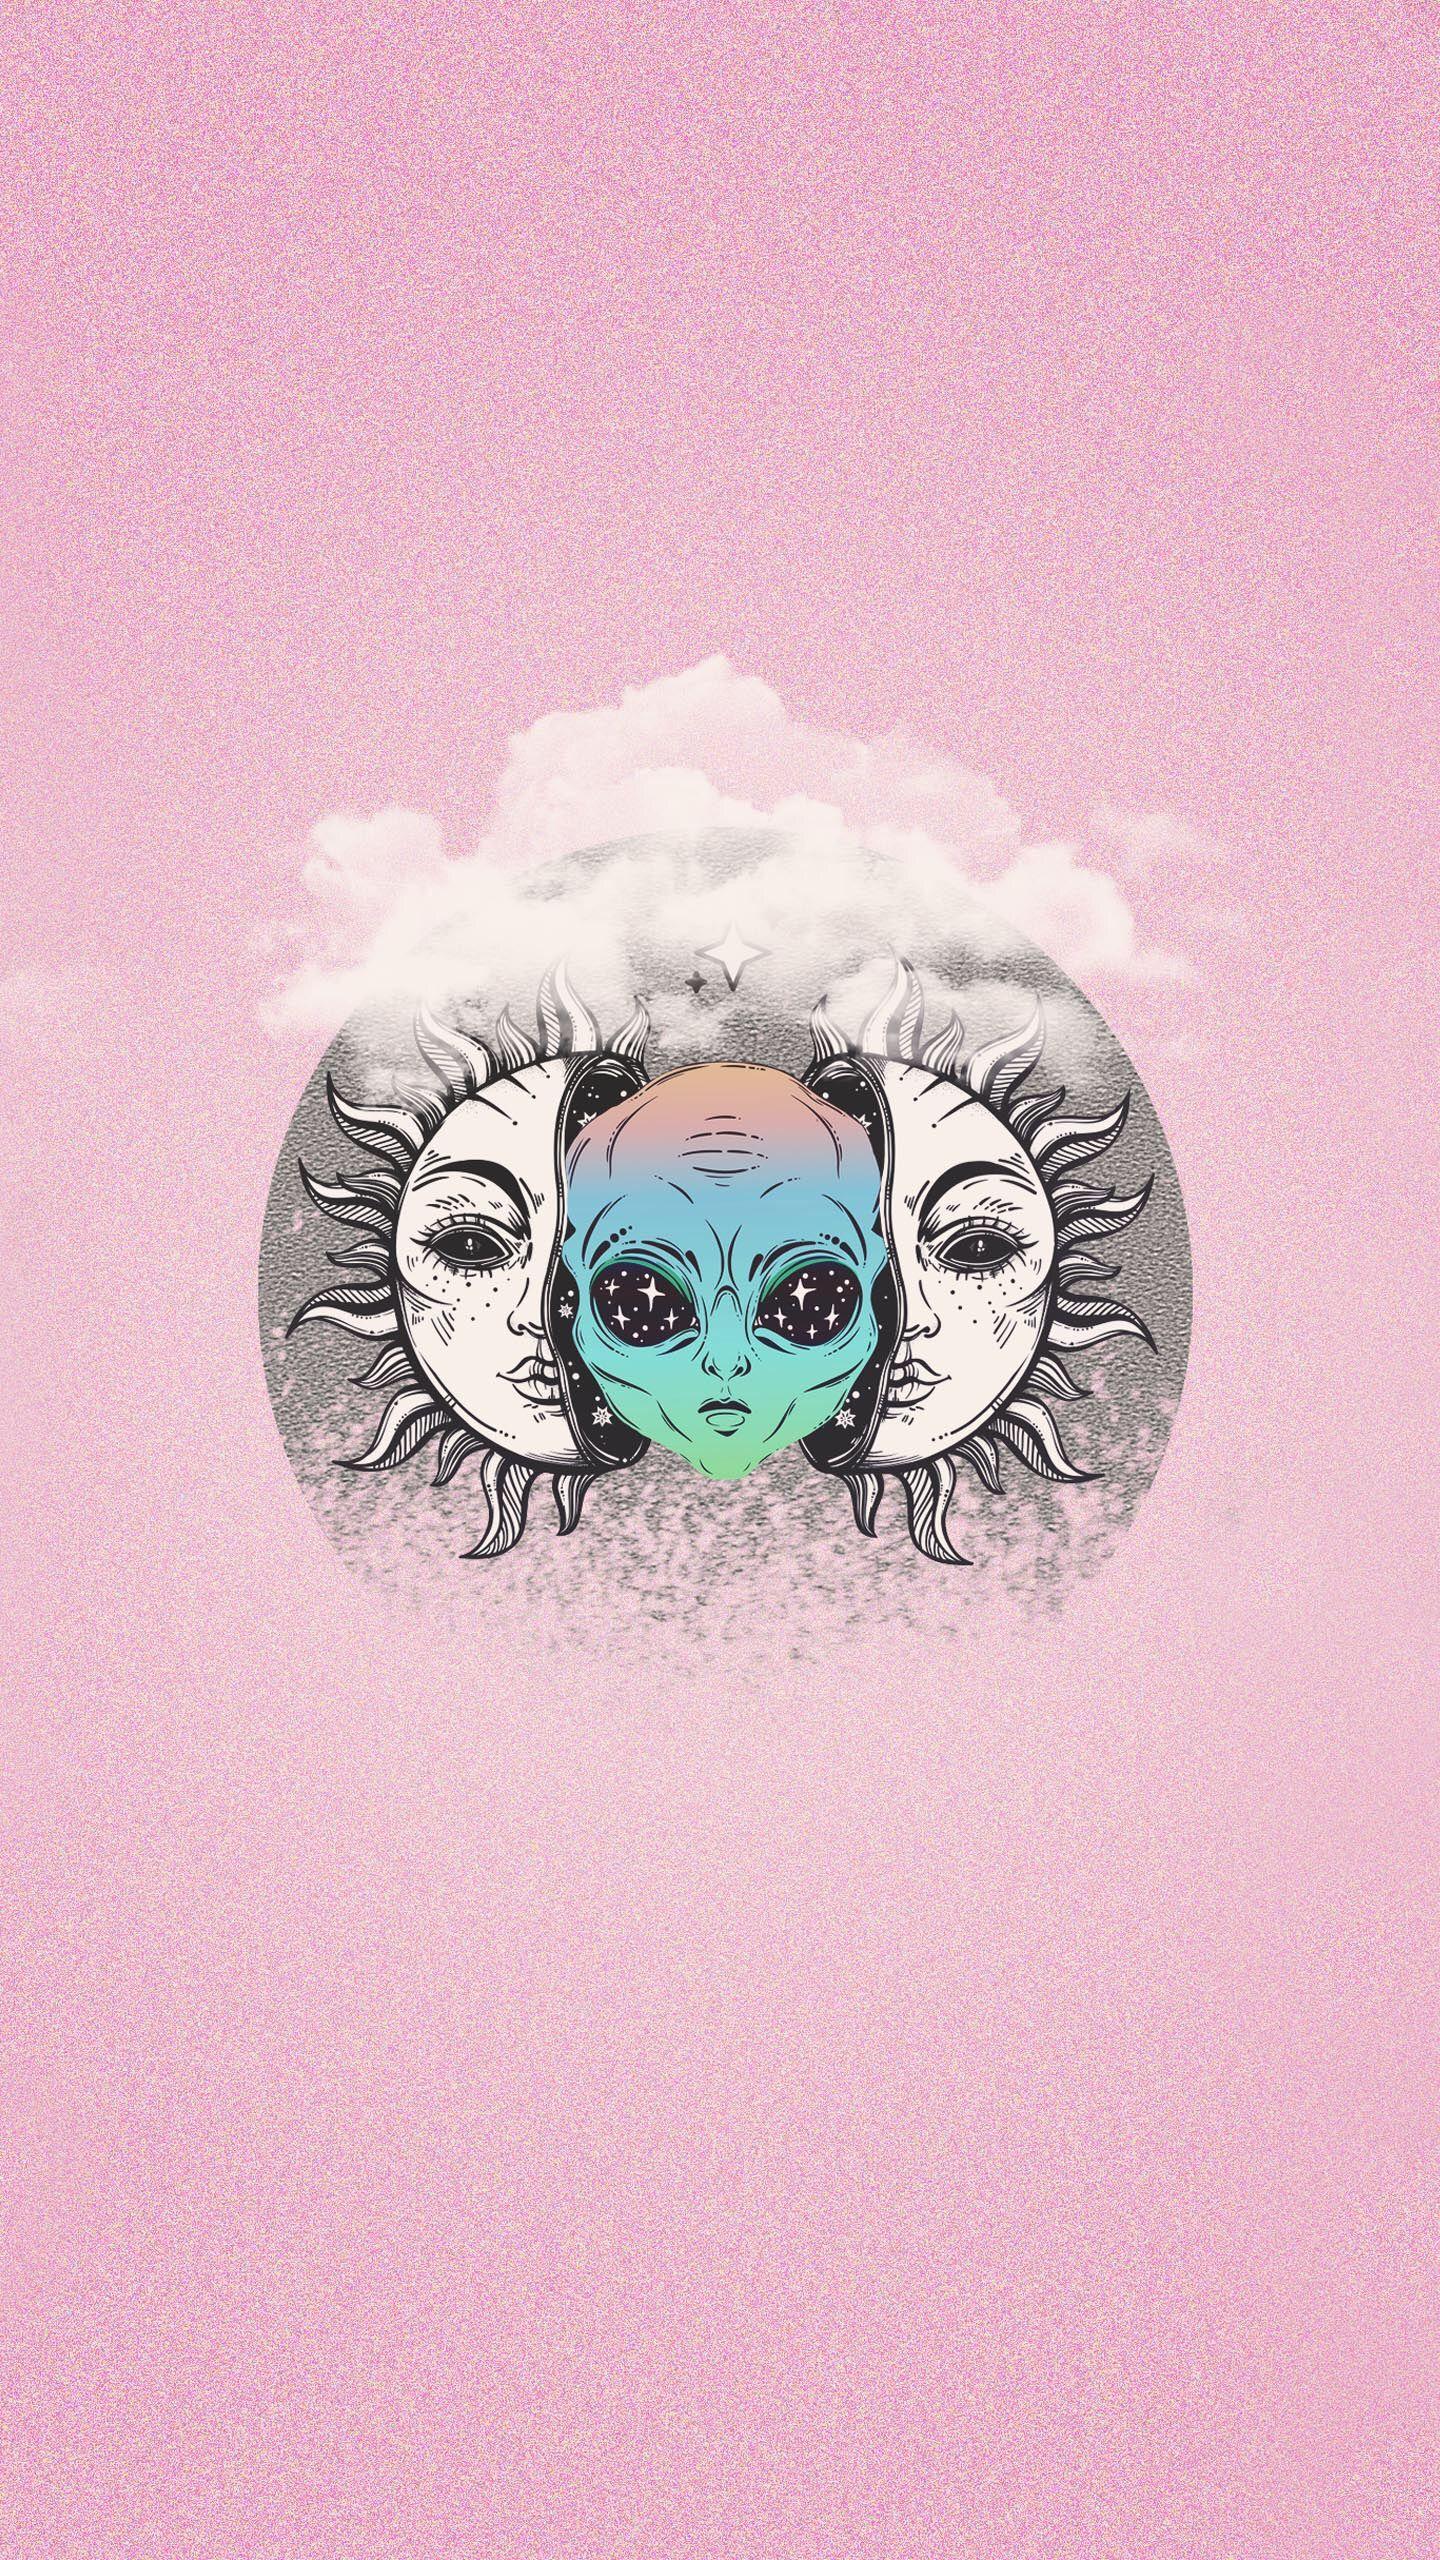 Pin By Rishika On 3 Hippie Wallpaper Psychedelic Art Trippy Wallpaper